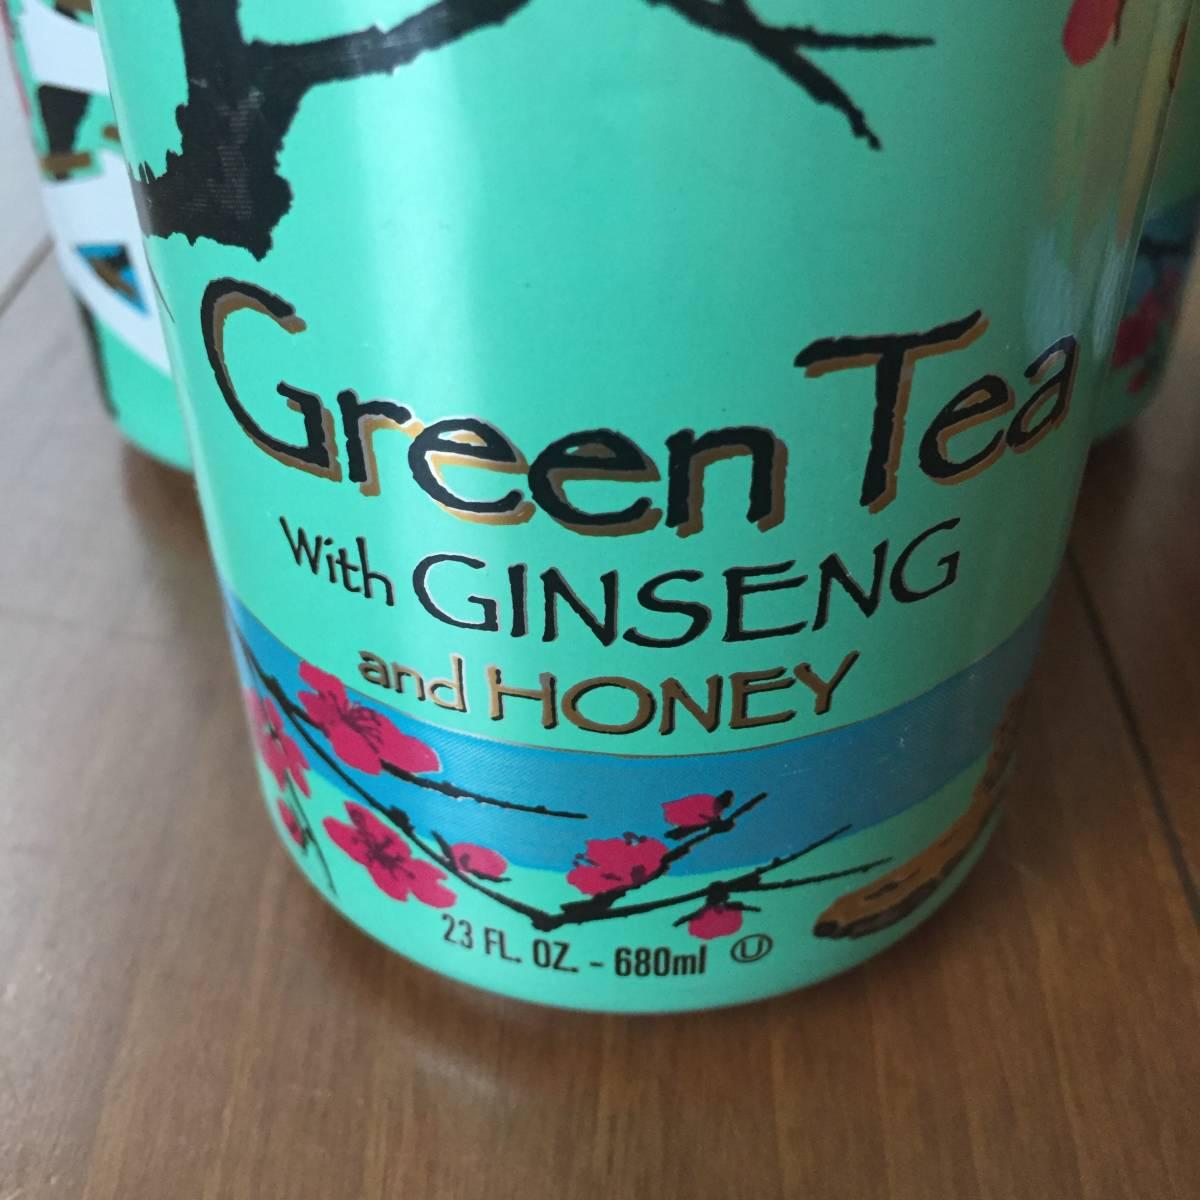 ARIZONA GREEN TEA GINSENG HONEY アリゾナ グリーン ティー ハワイ アメリカ 日本未発売 日本未入荷 海外限定 緑茶 レモンティ 680ml_画像4